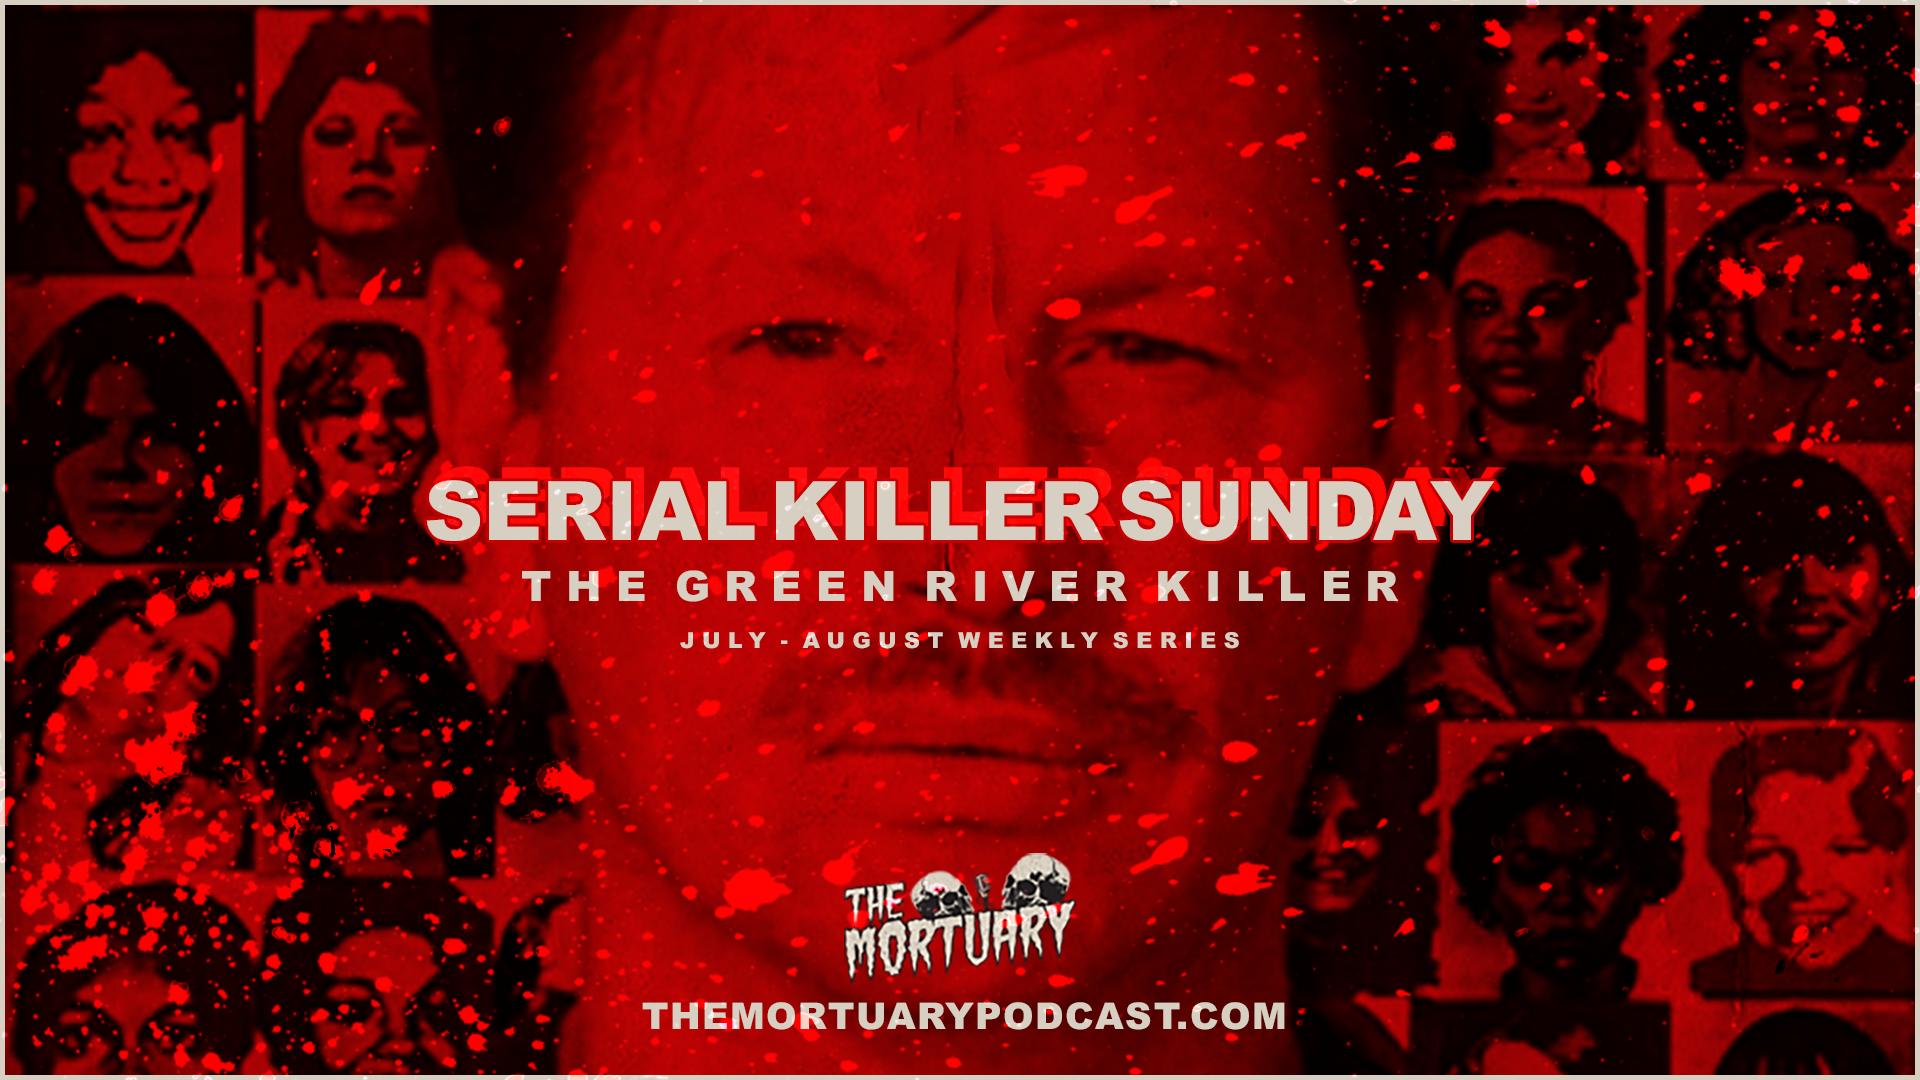 Green River Killer Serial Killer Sunday 2019 Thumb Template.png